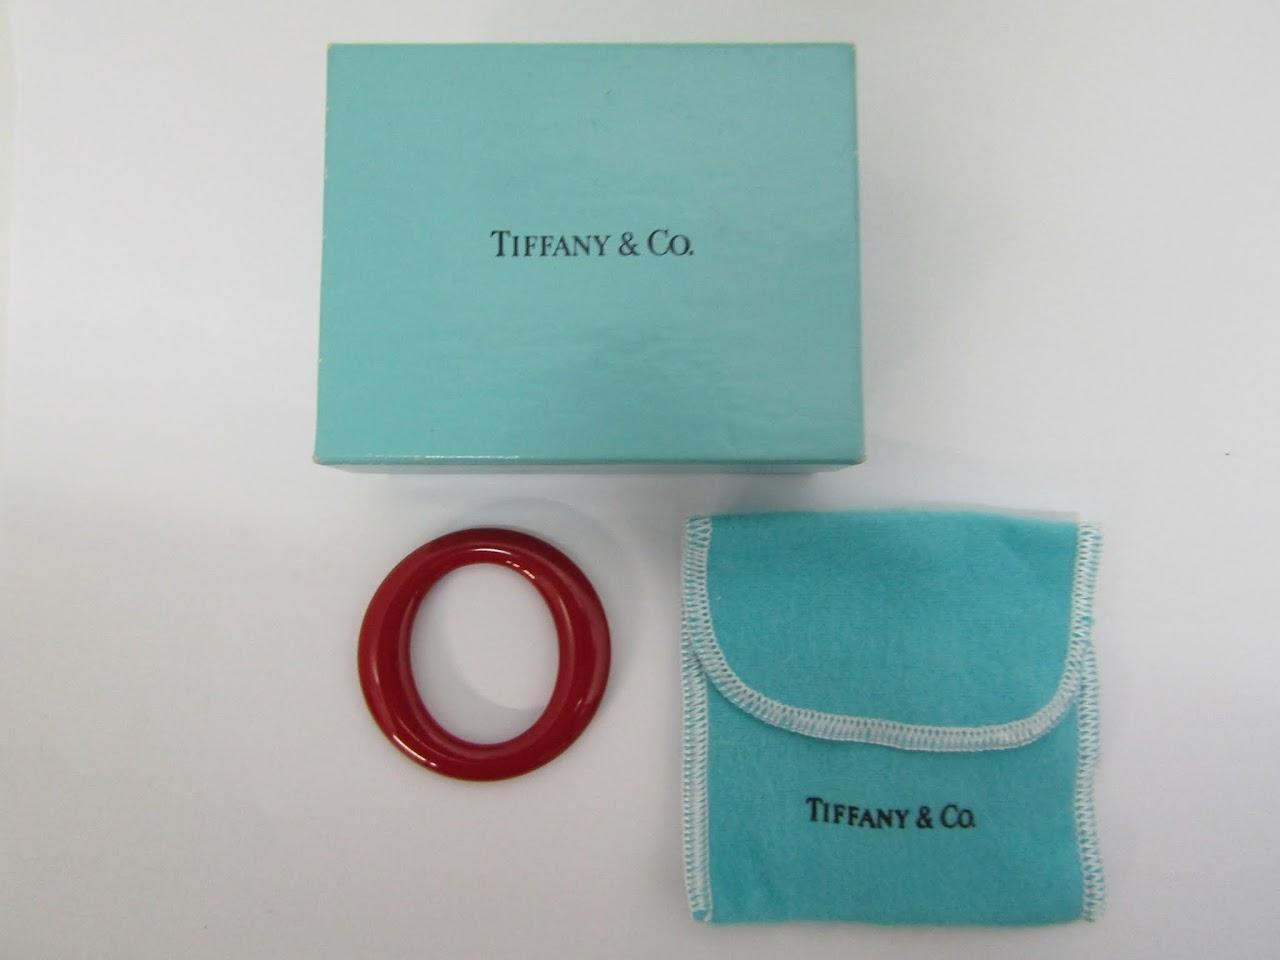 Tiffany & Co Japan Scarf Ring